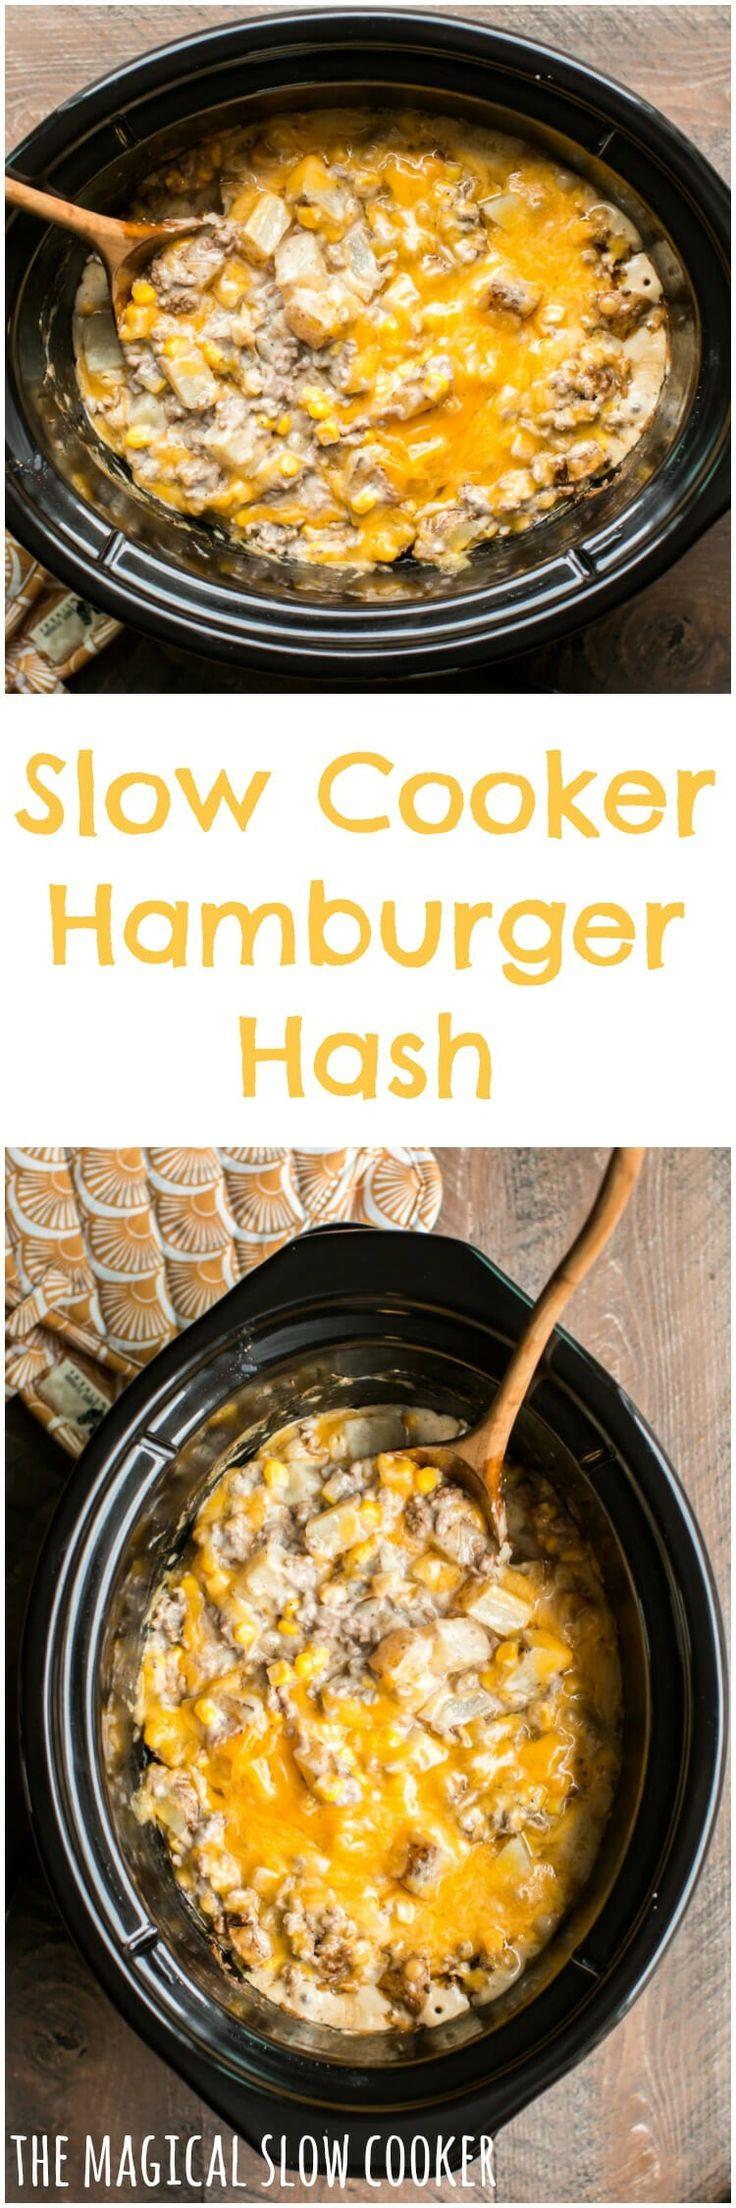 Slow Cooker Hamburger Hash